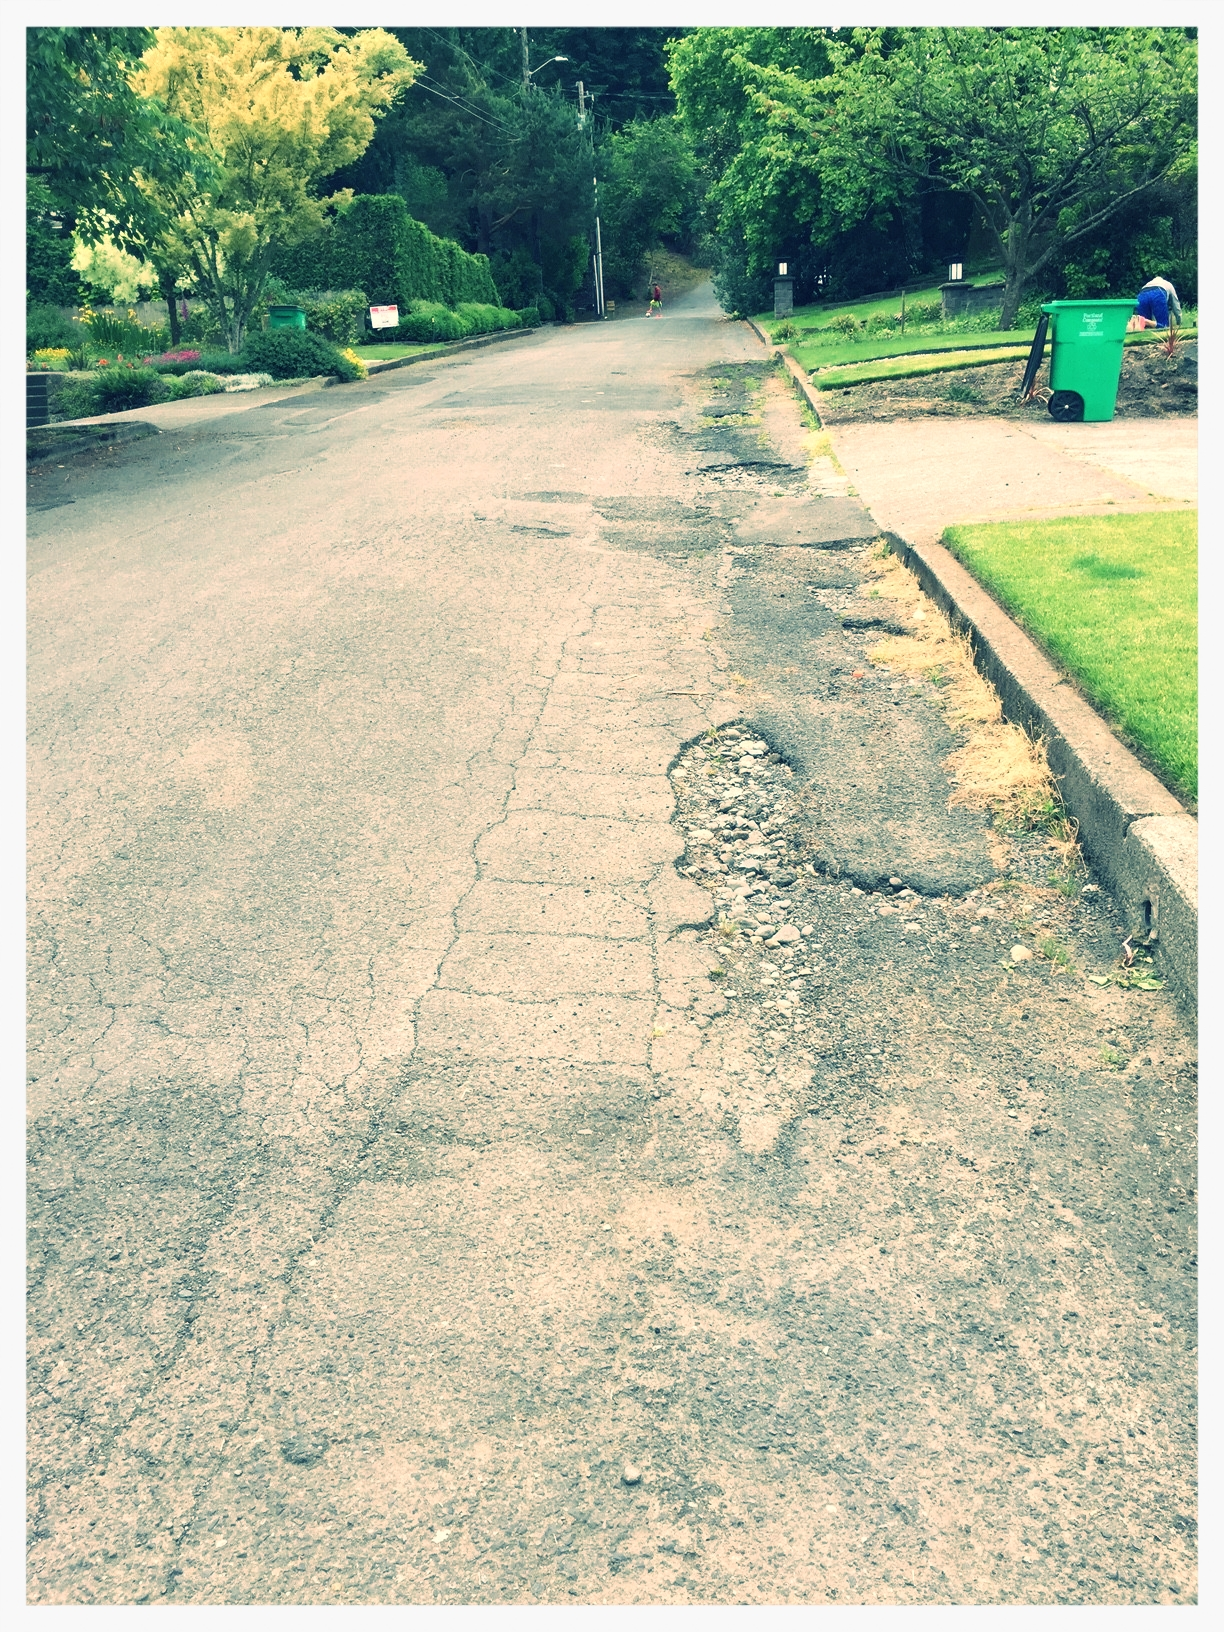 Proposed High Volume Traffic Street - Disrepair & No Sidewalks